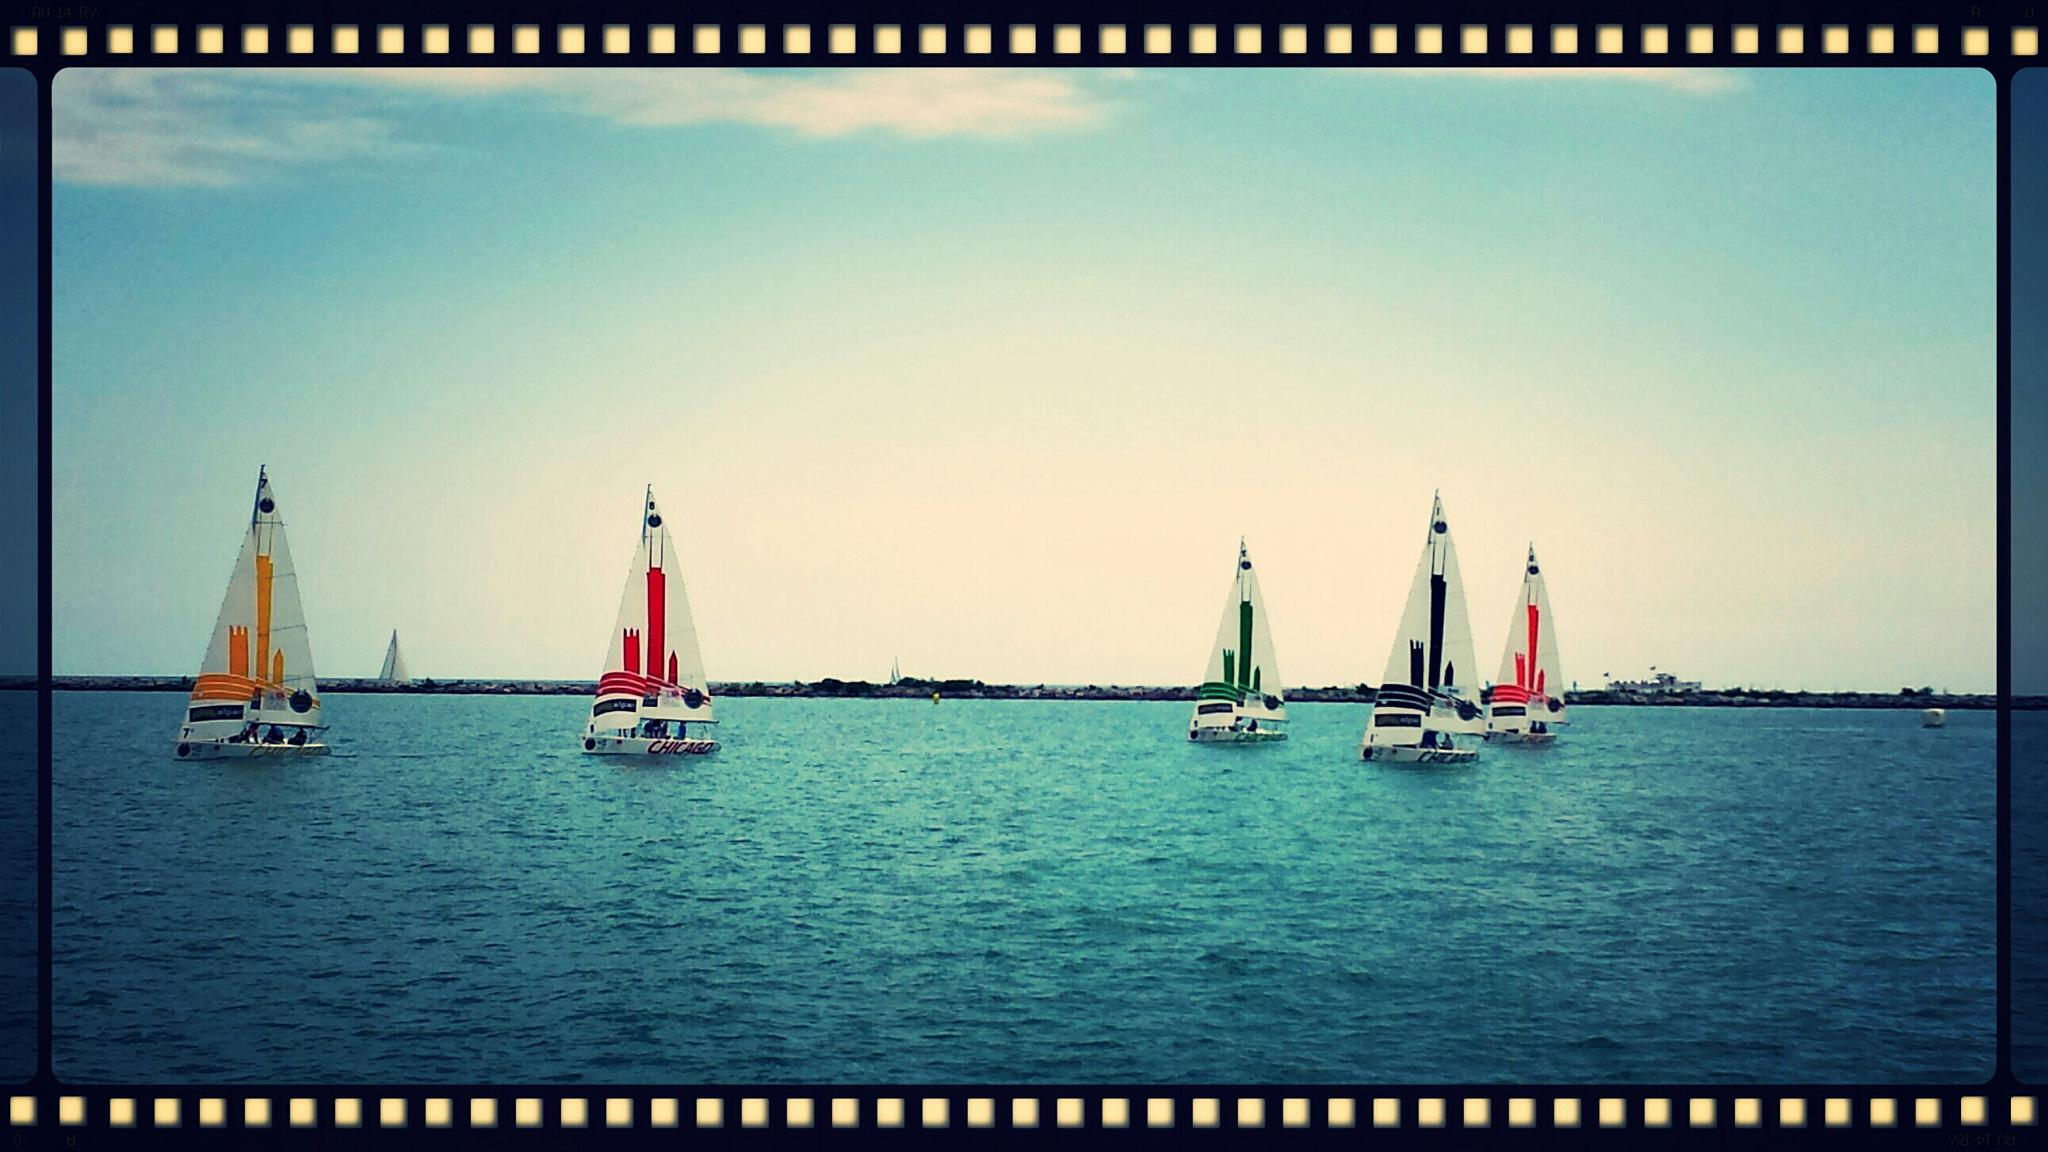 Chicago Harbor Race by mimi.difrancesca